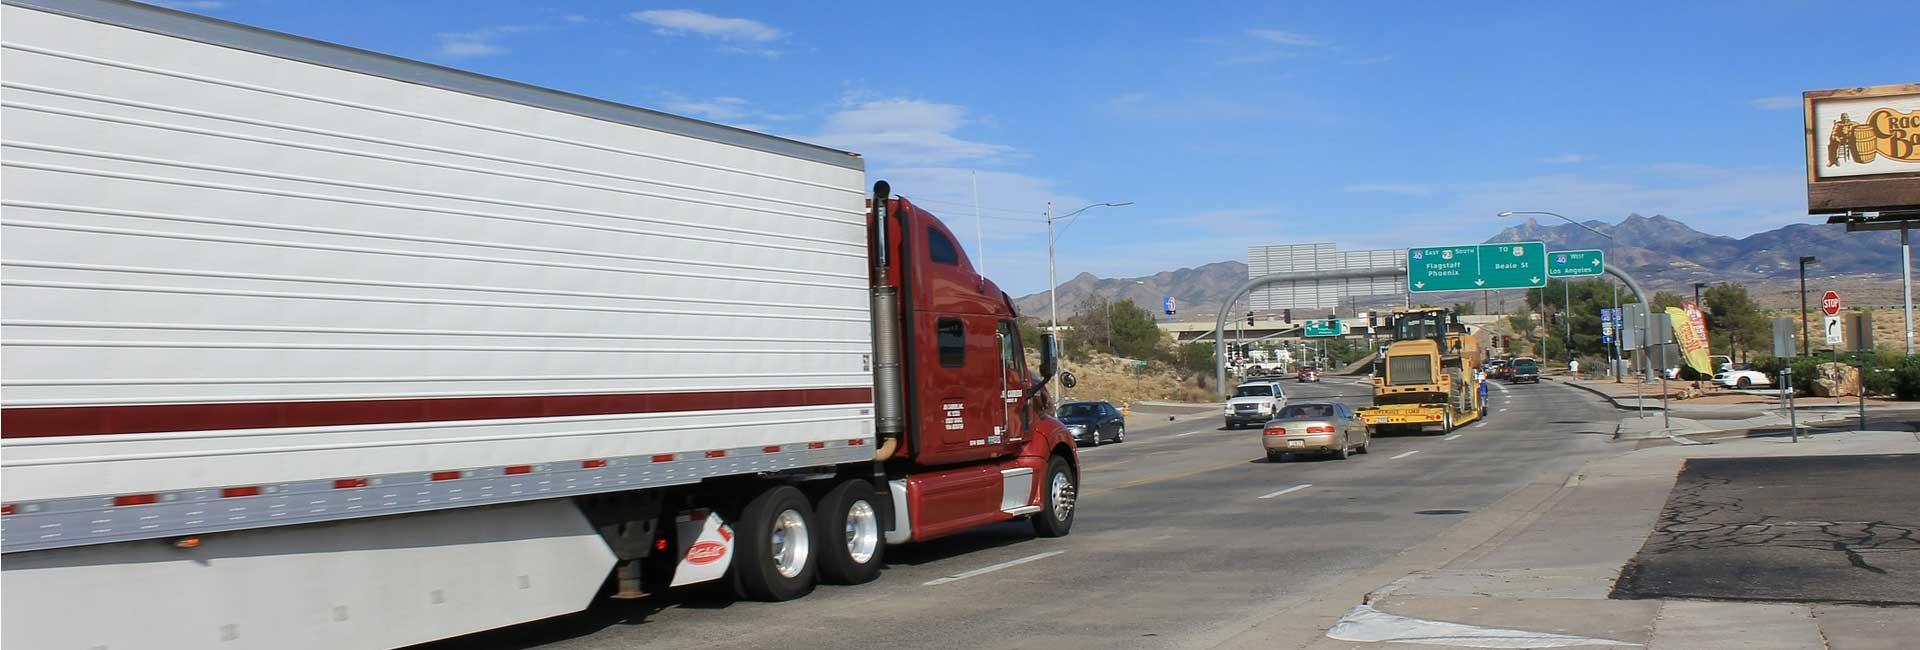 North Dakota Trucking Company